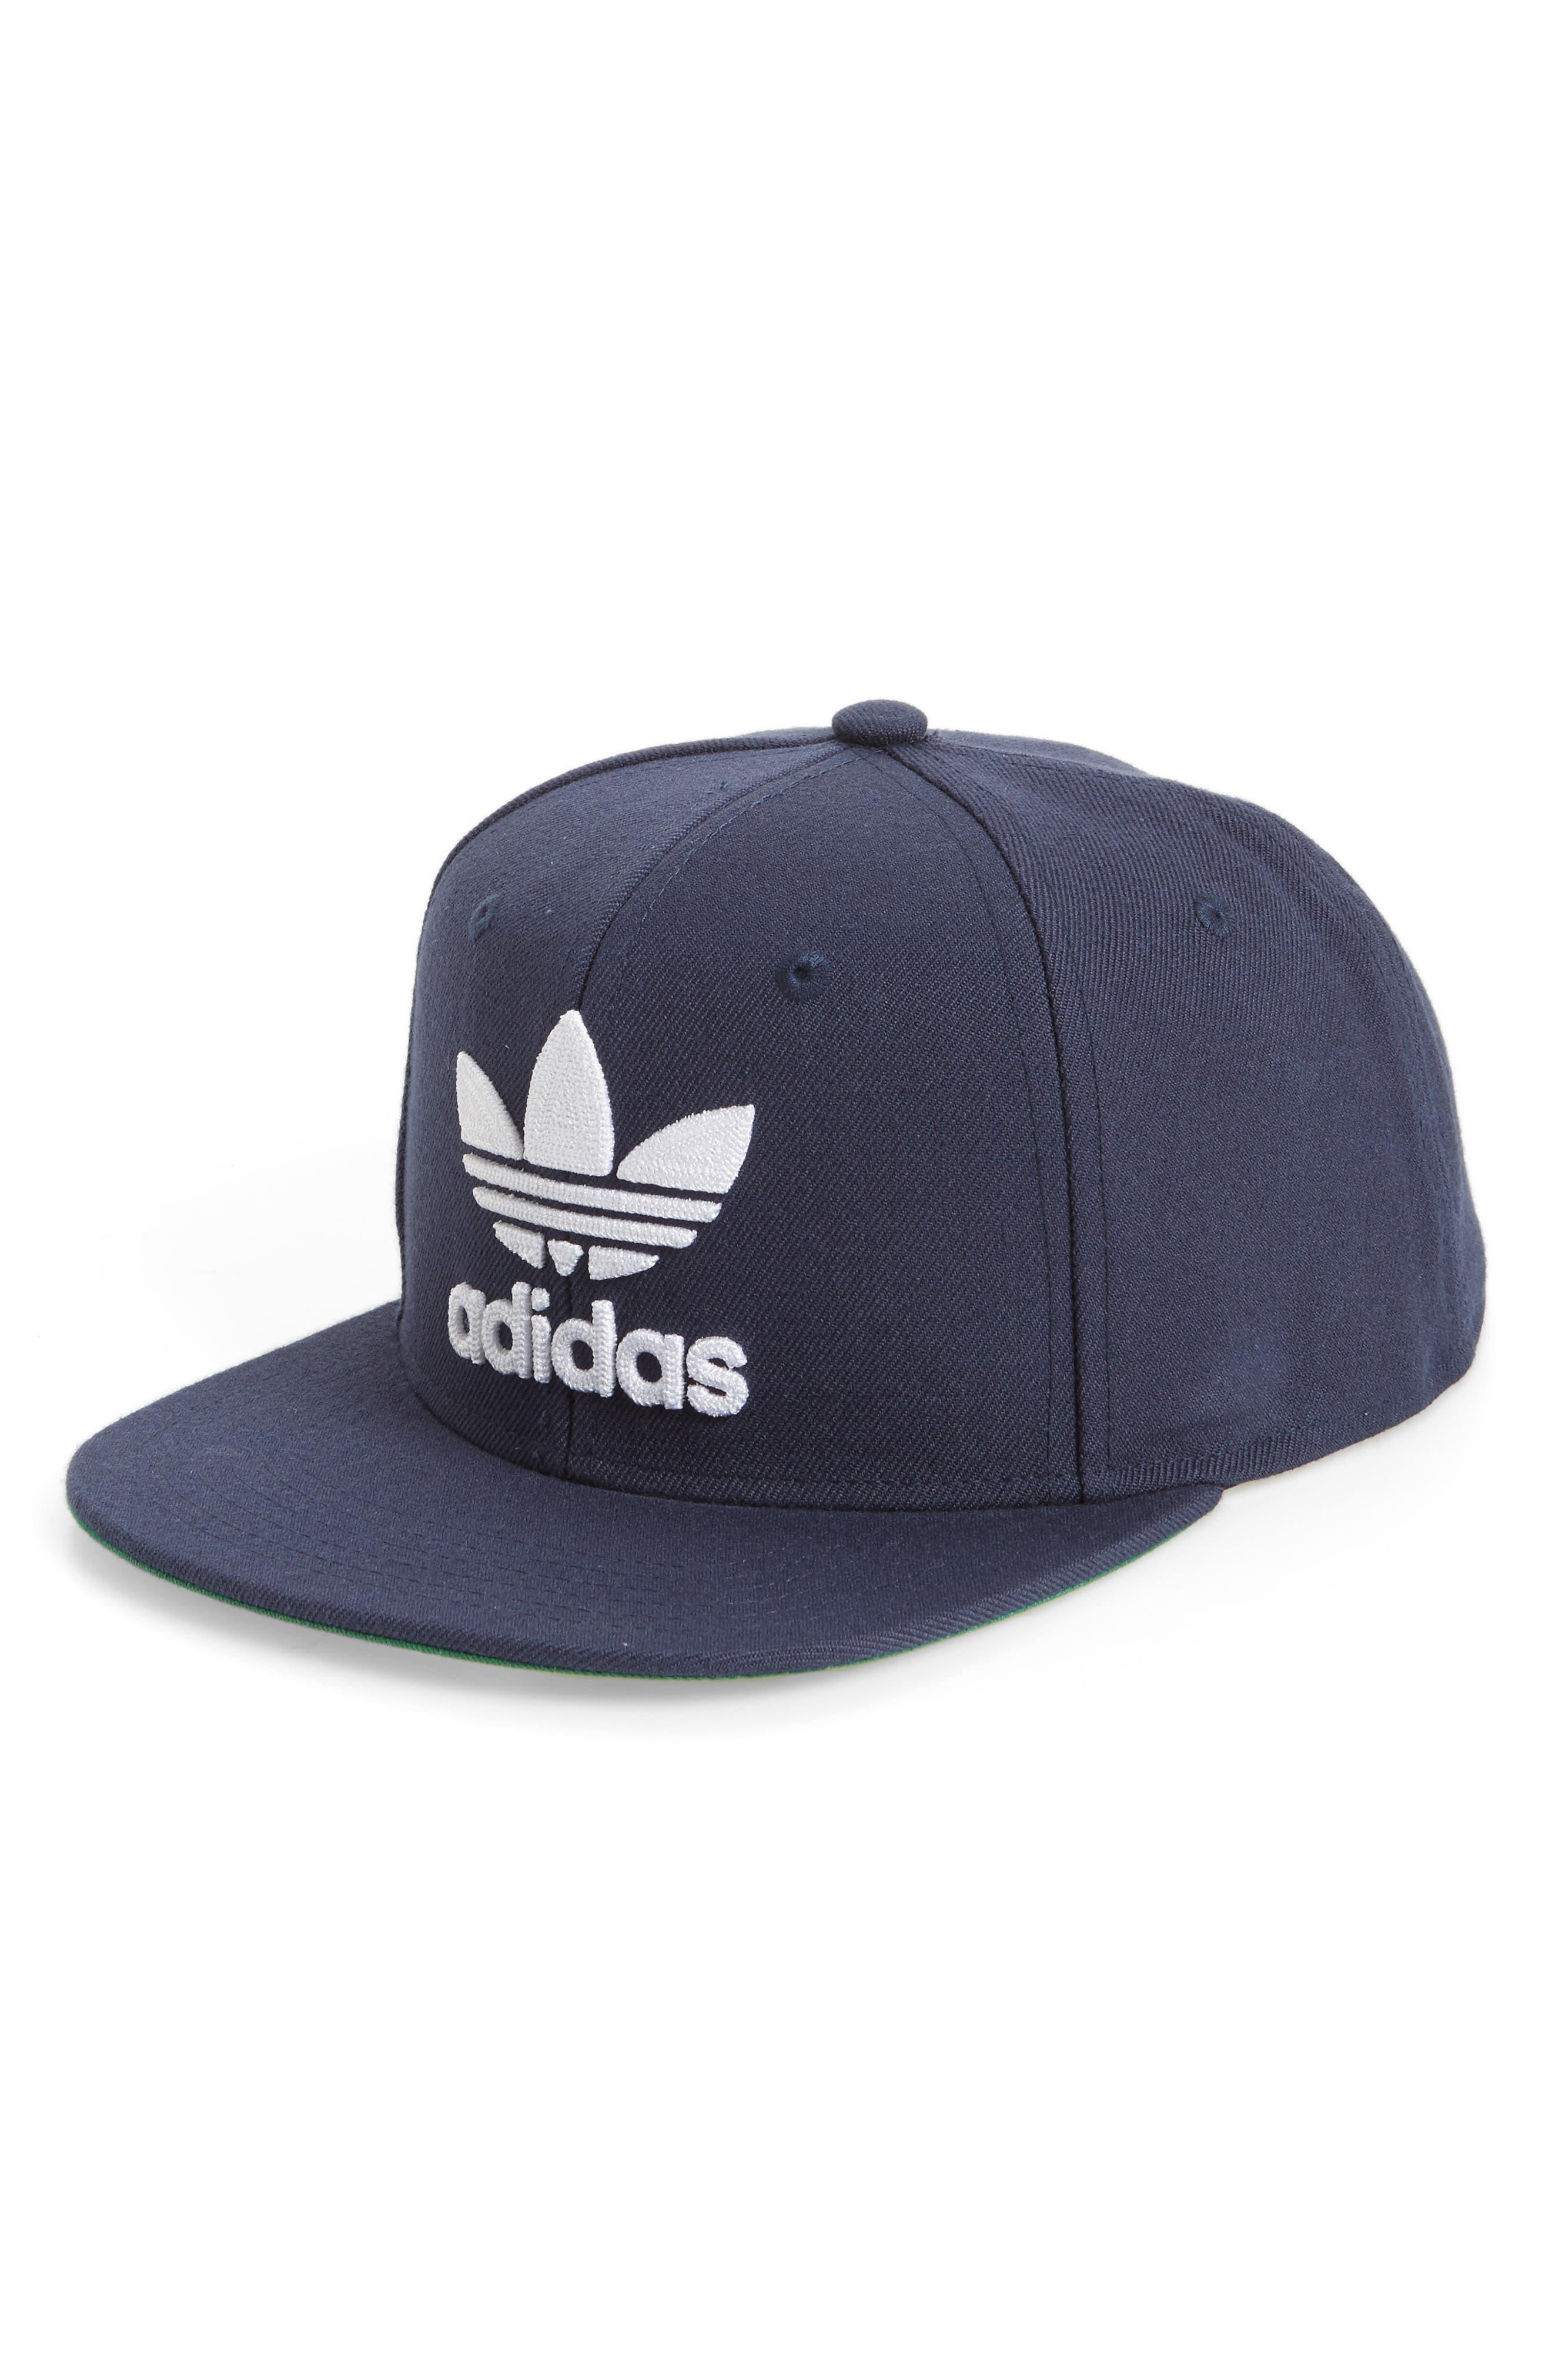 Main Image - adidas Trefoil Chain Snapback Baseball Cap